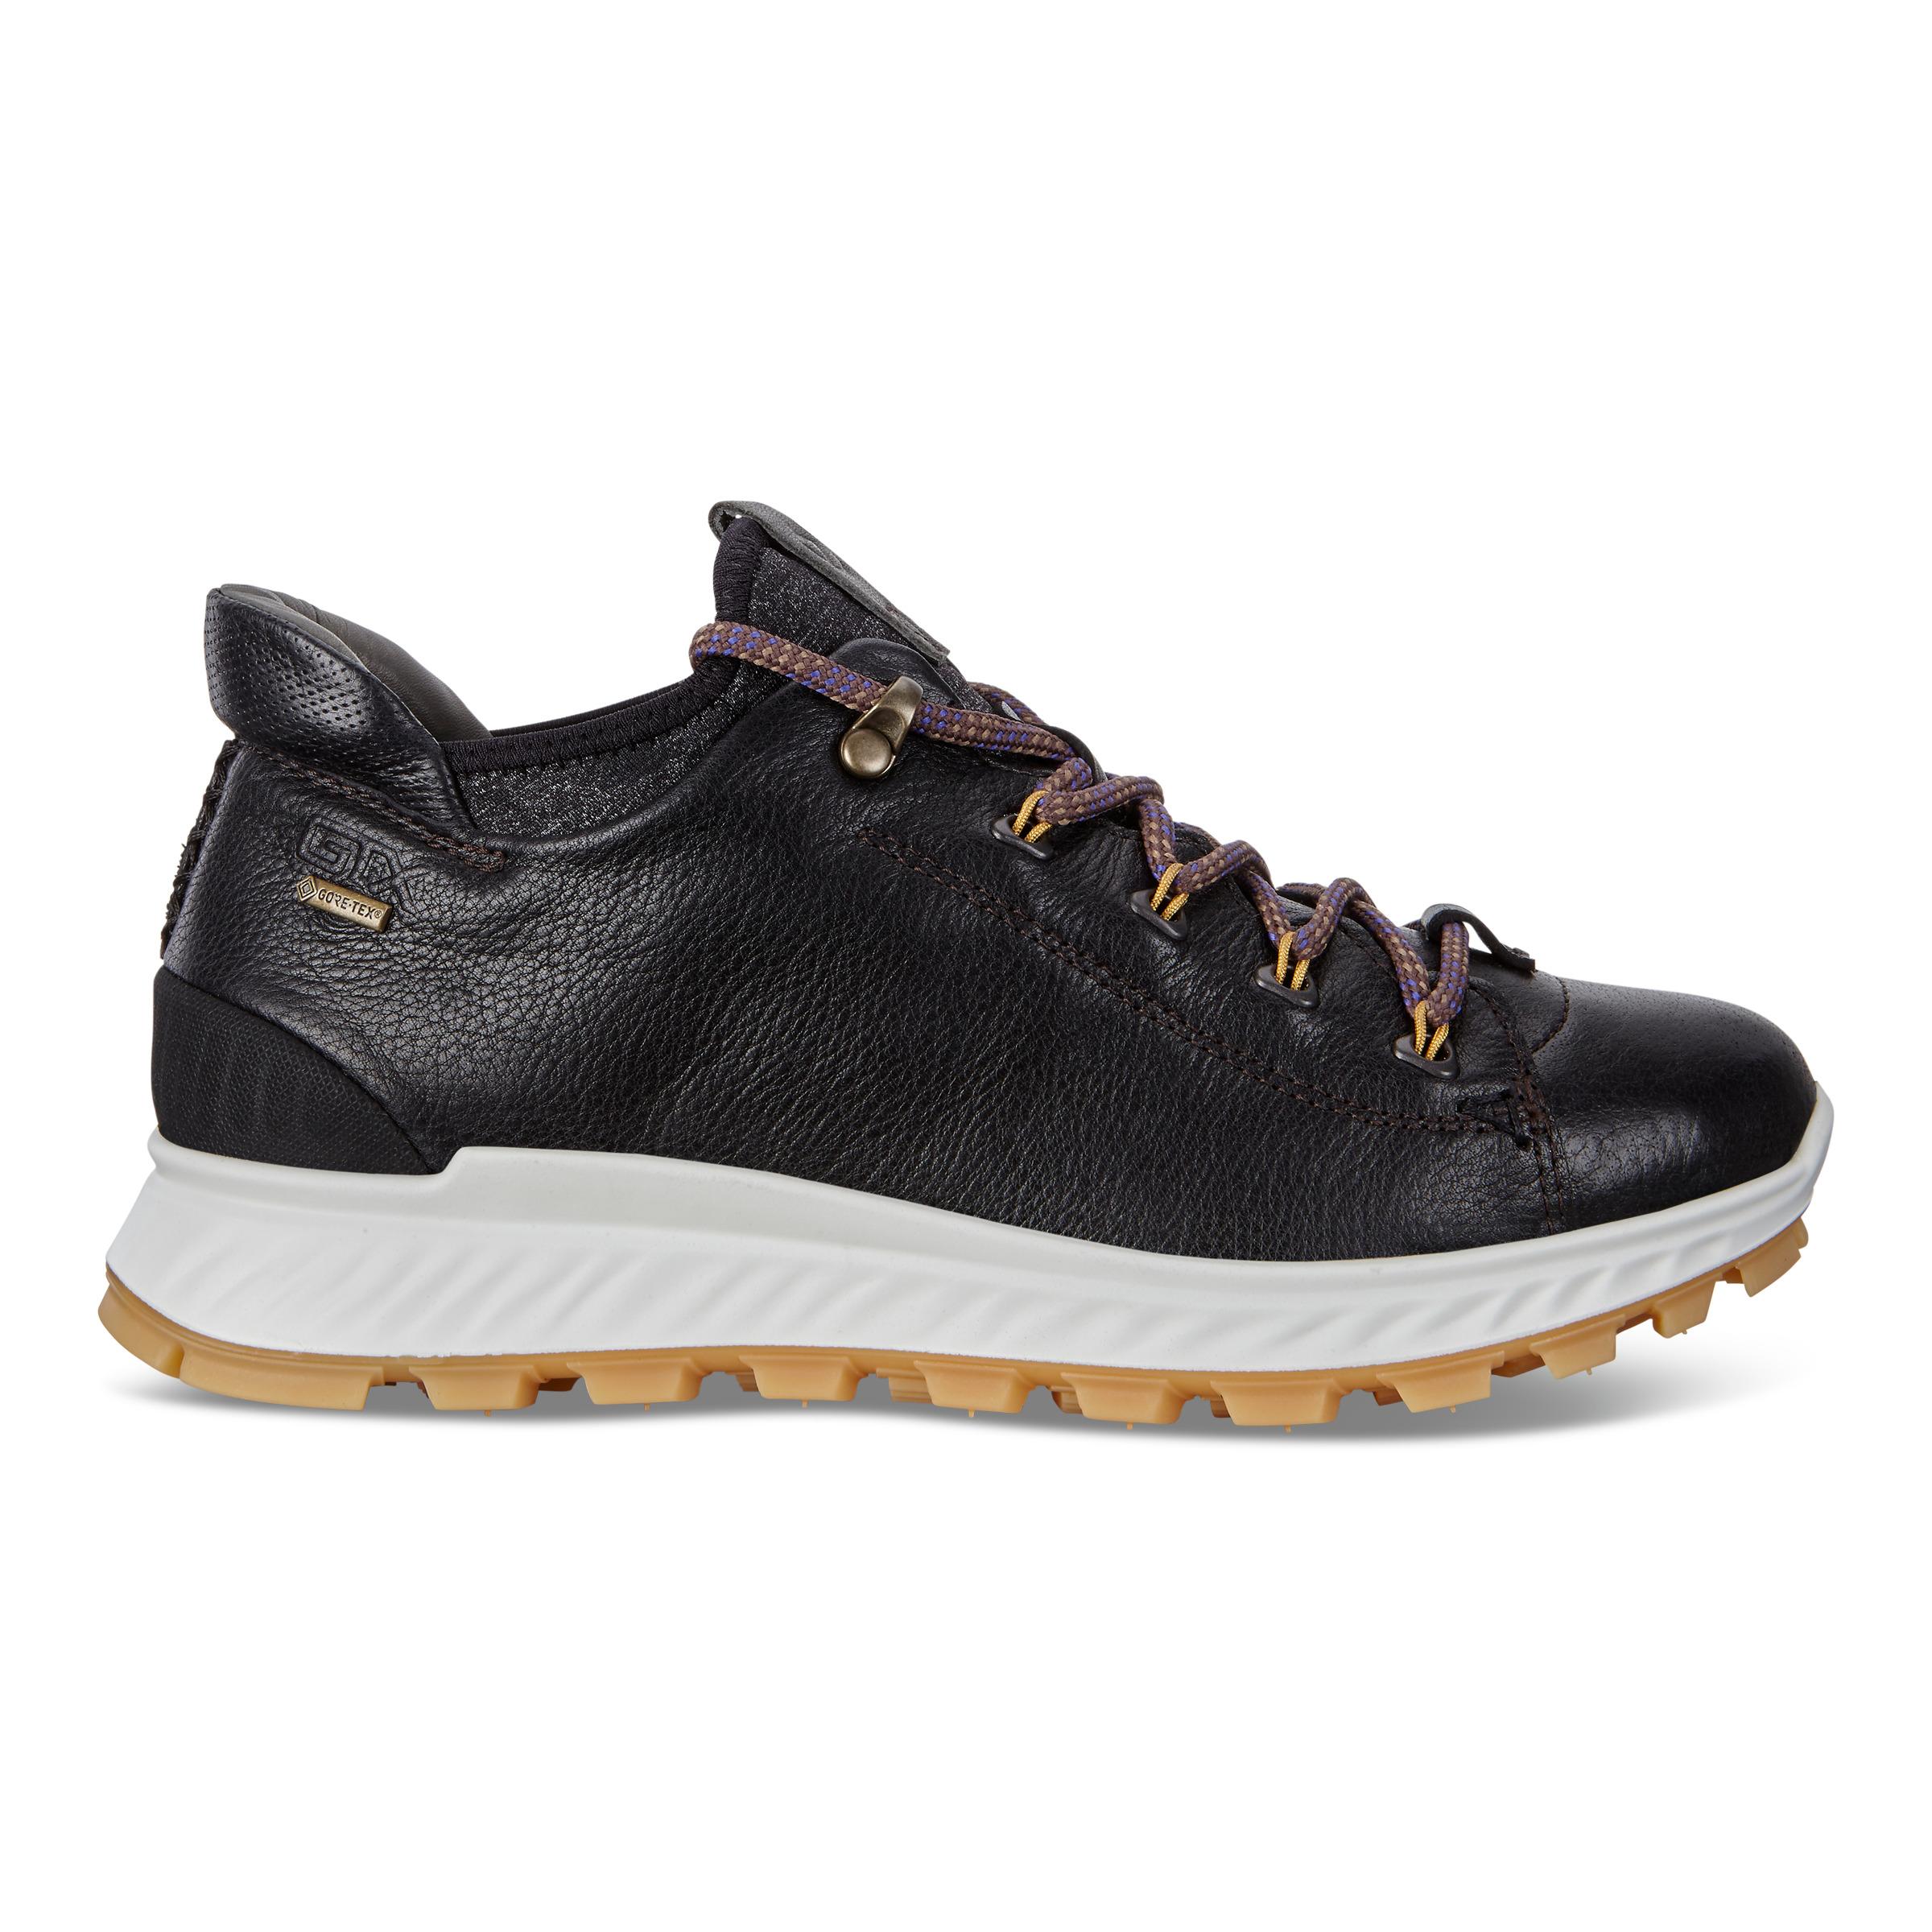 ECCO Womens Exostrike Gtx Mid Boots Size 5-5.5 Black